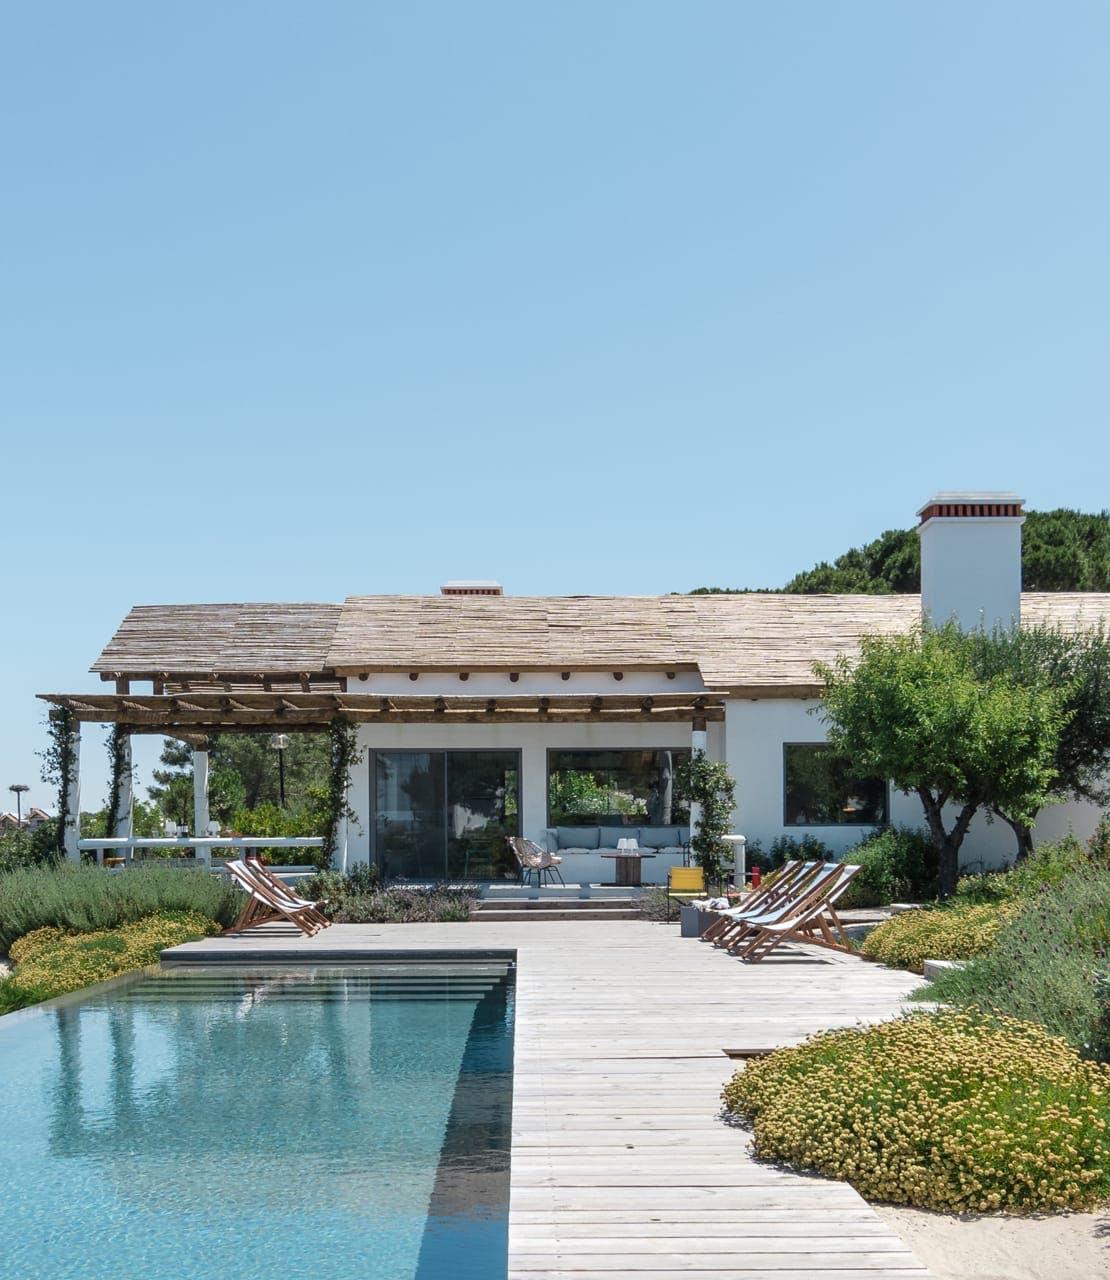 Swimming pool in luxurious garden